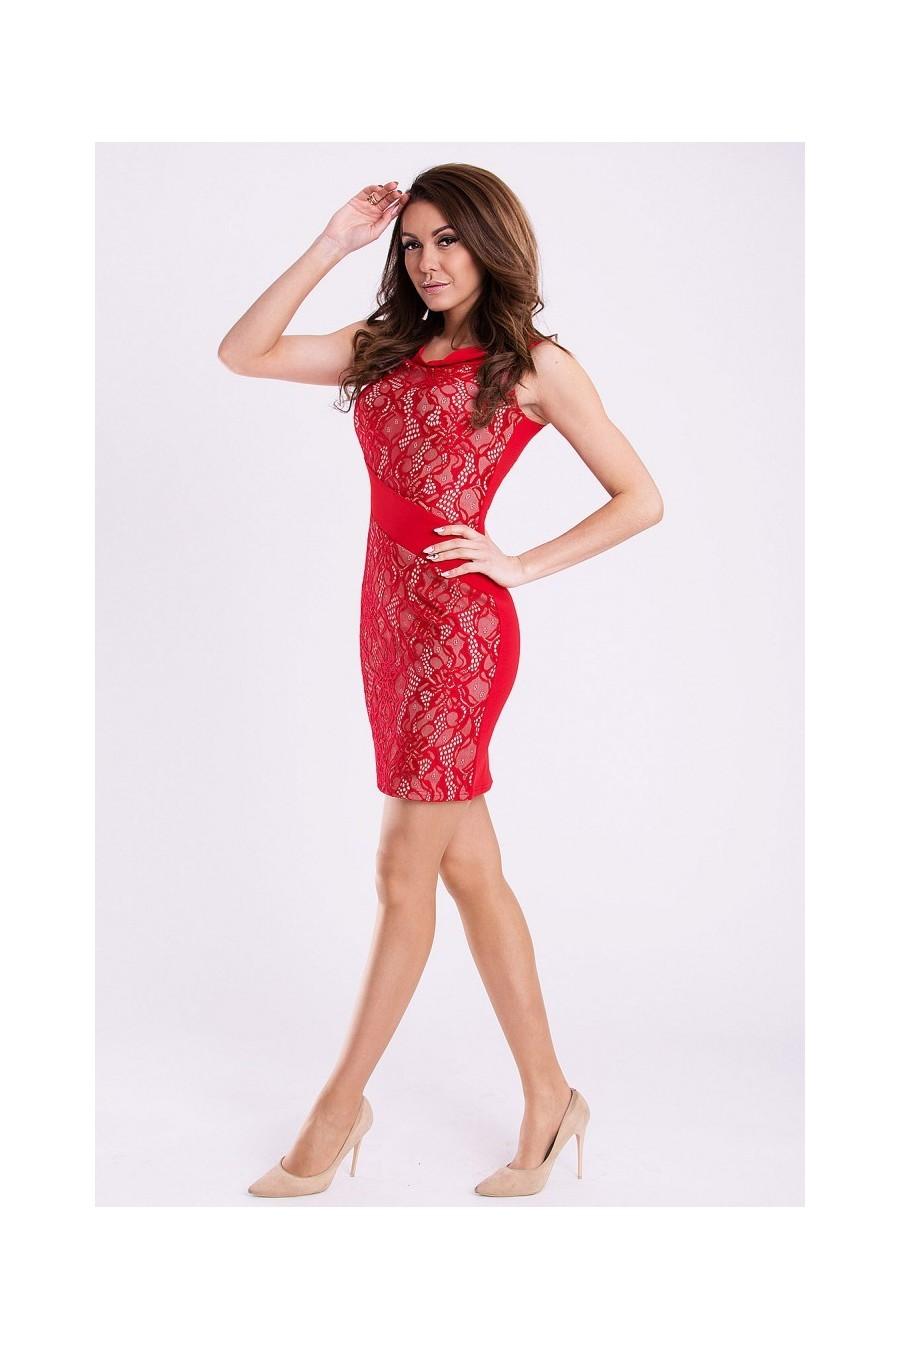 fbf049c9debb Dámske čipkované šaty 2980 - Spoločenské šaty Online